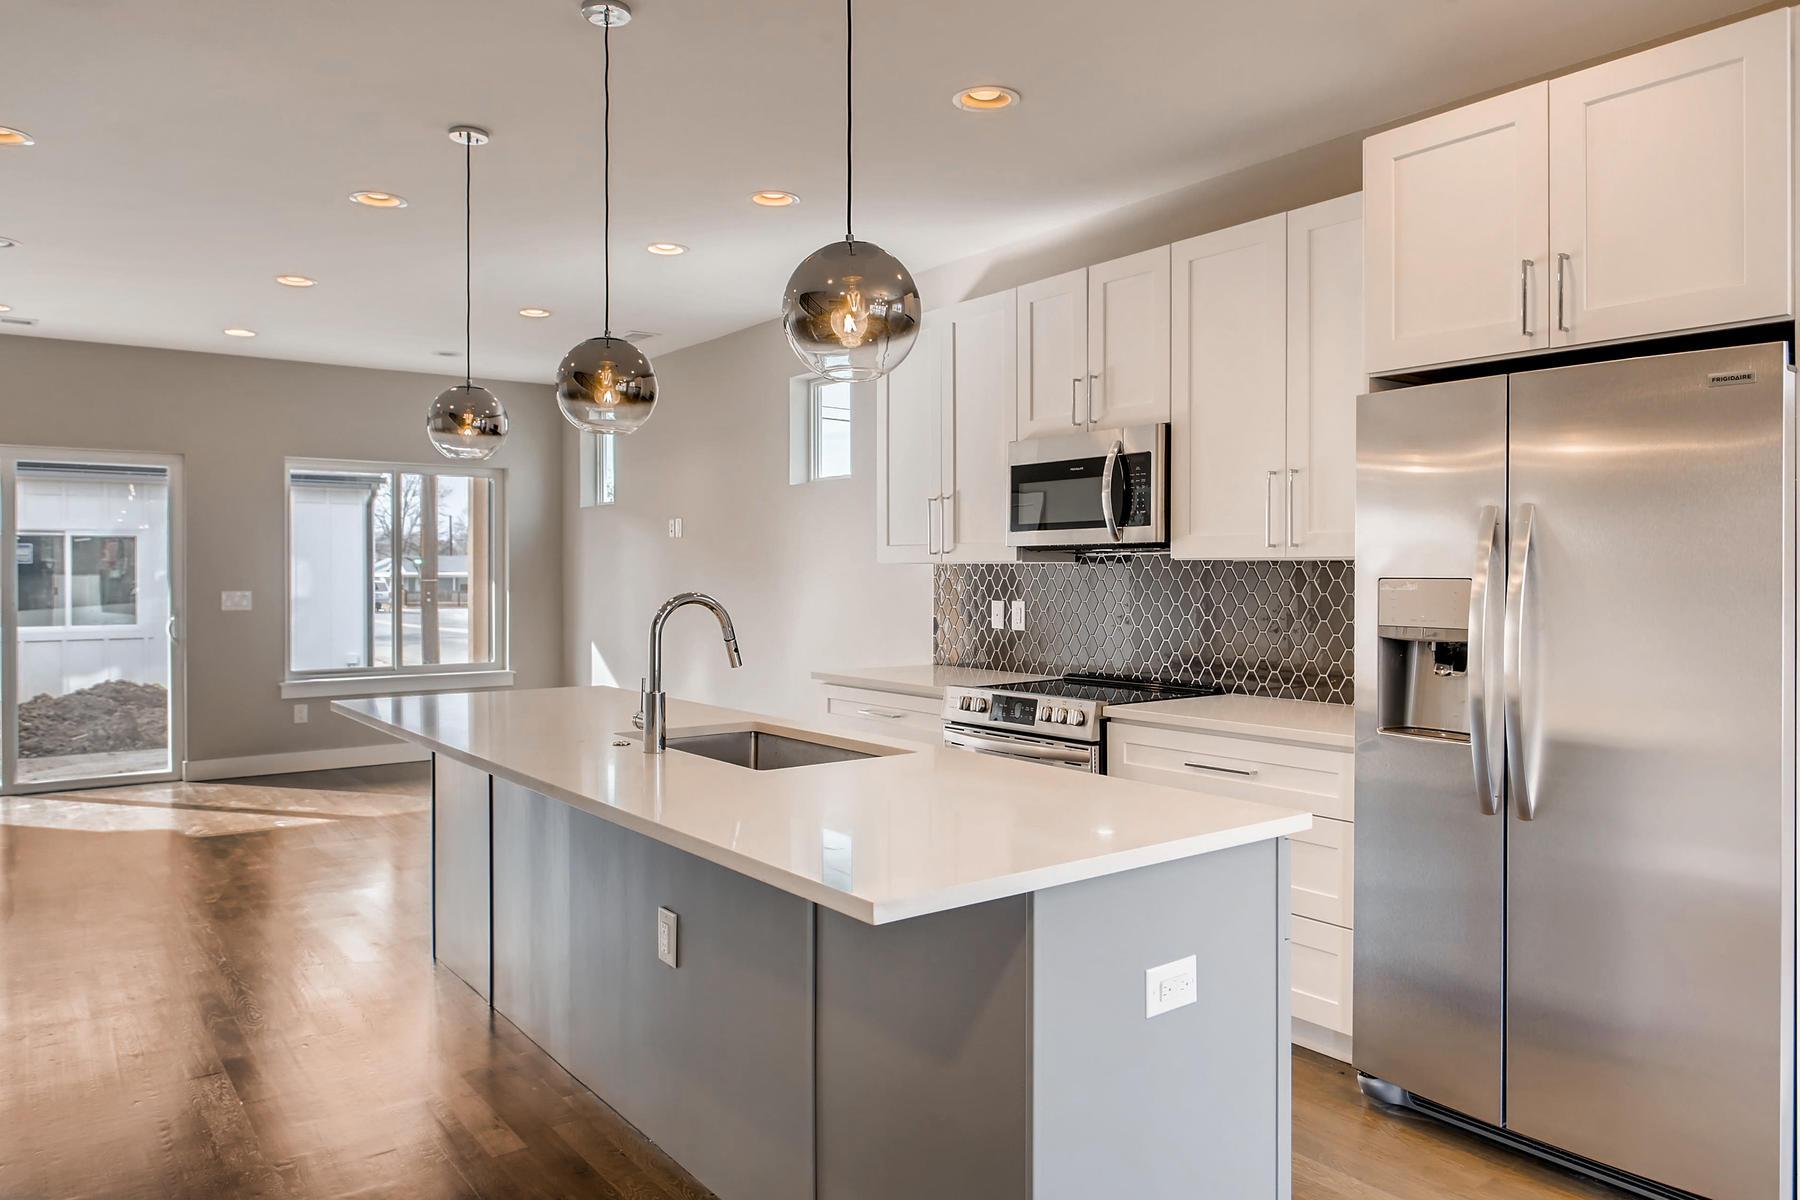 3101 S Cherokee St Englewood-008-12-Kitchen-MLS_Size.jpg